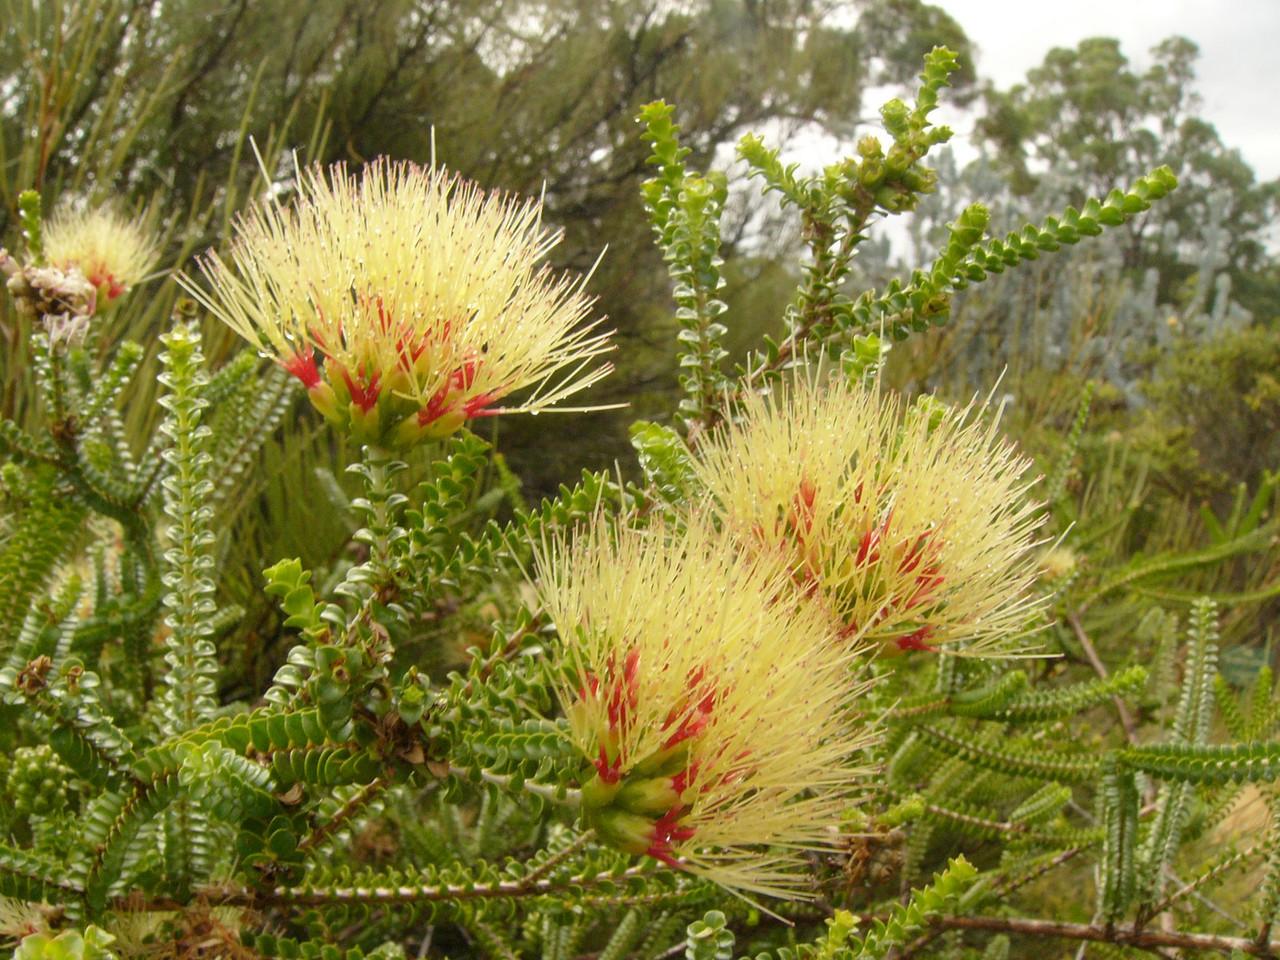 20060426_2122 Sand bottlebrush (Beaufortia squarrosa) Botanical gardens, Perth.